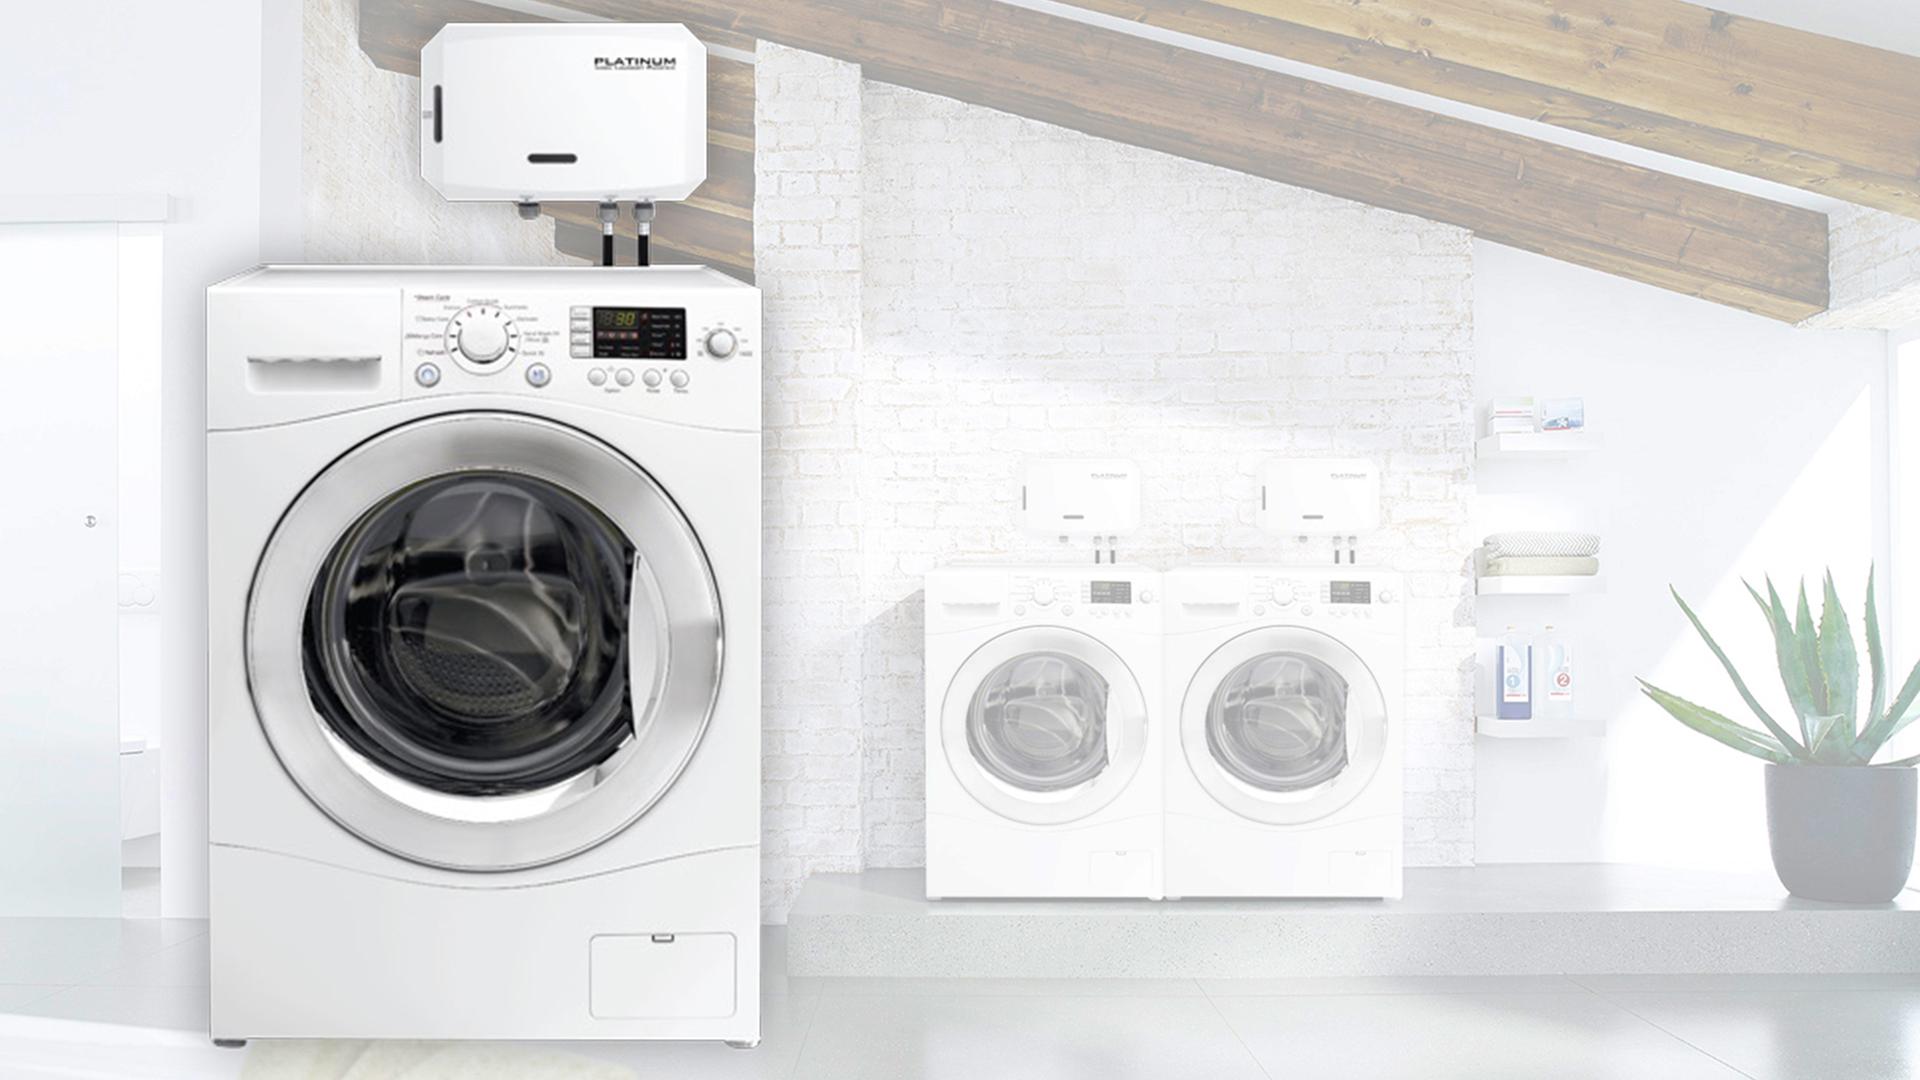 Platinum Laundry Purifier - Visit WebsiteWarranty Info